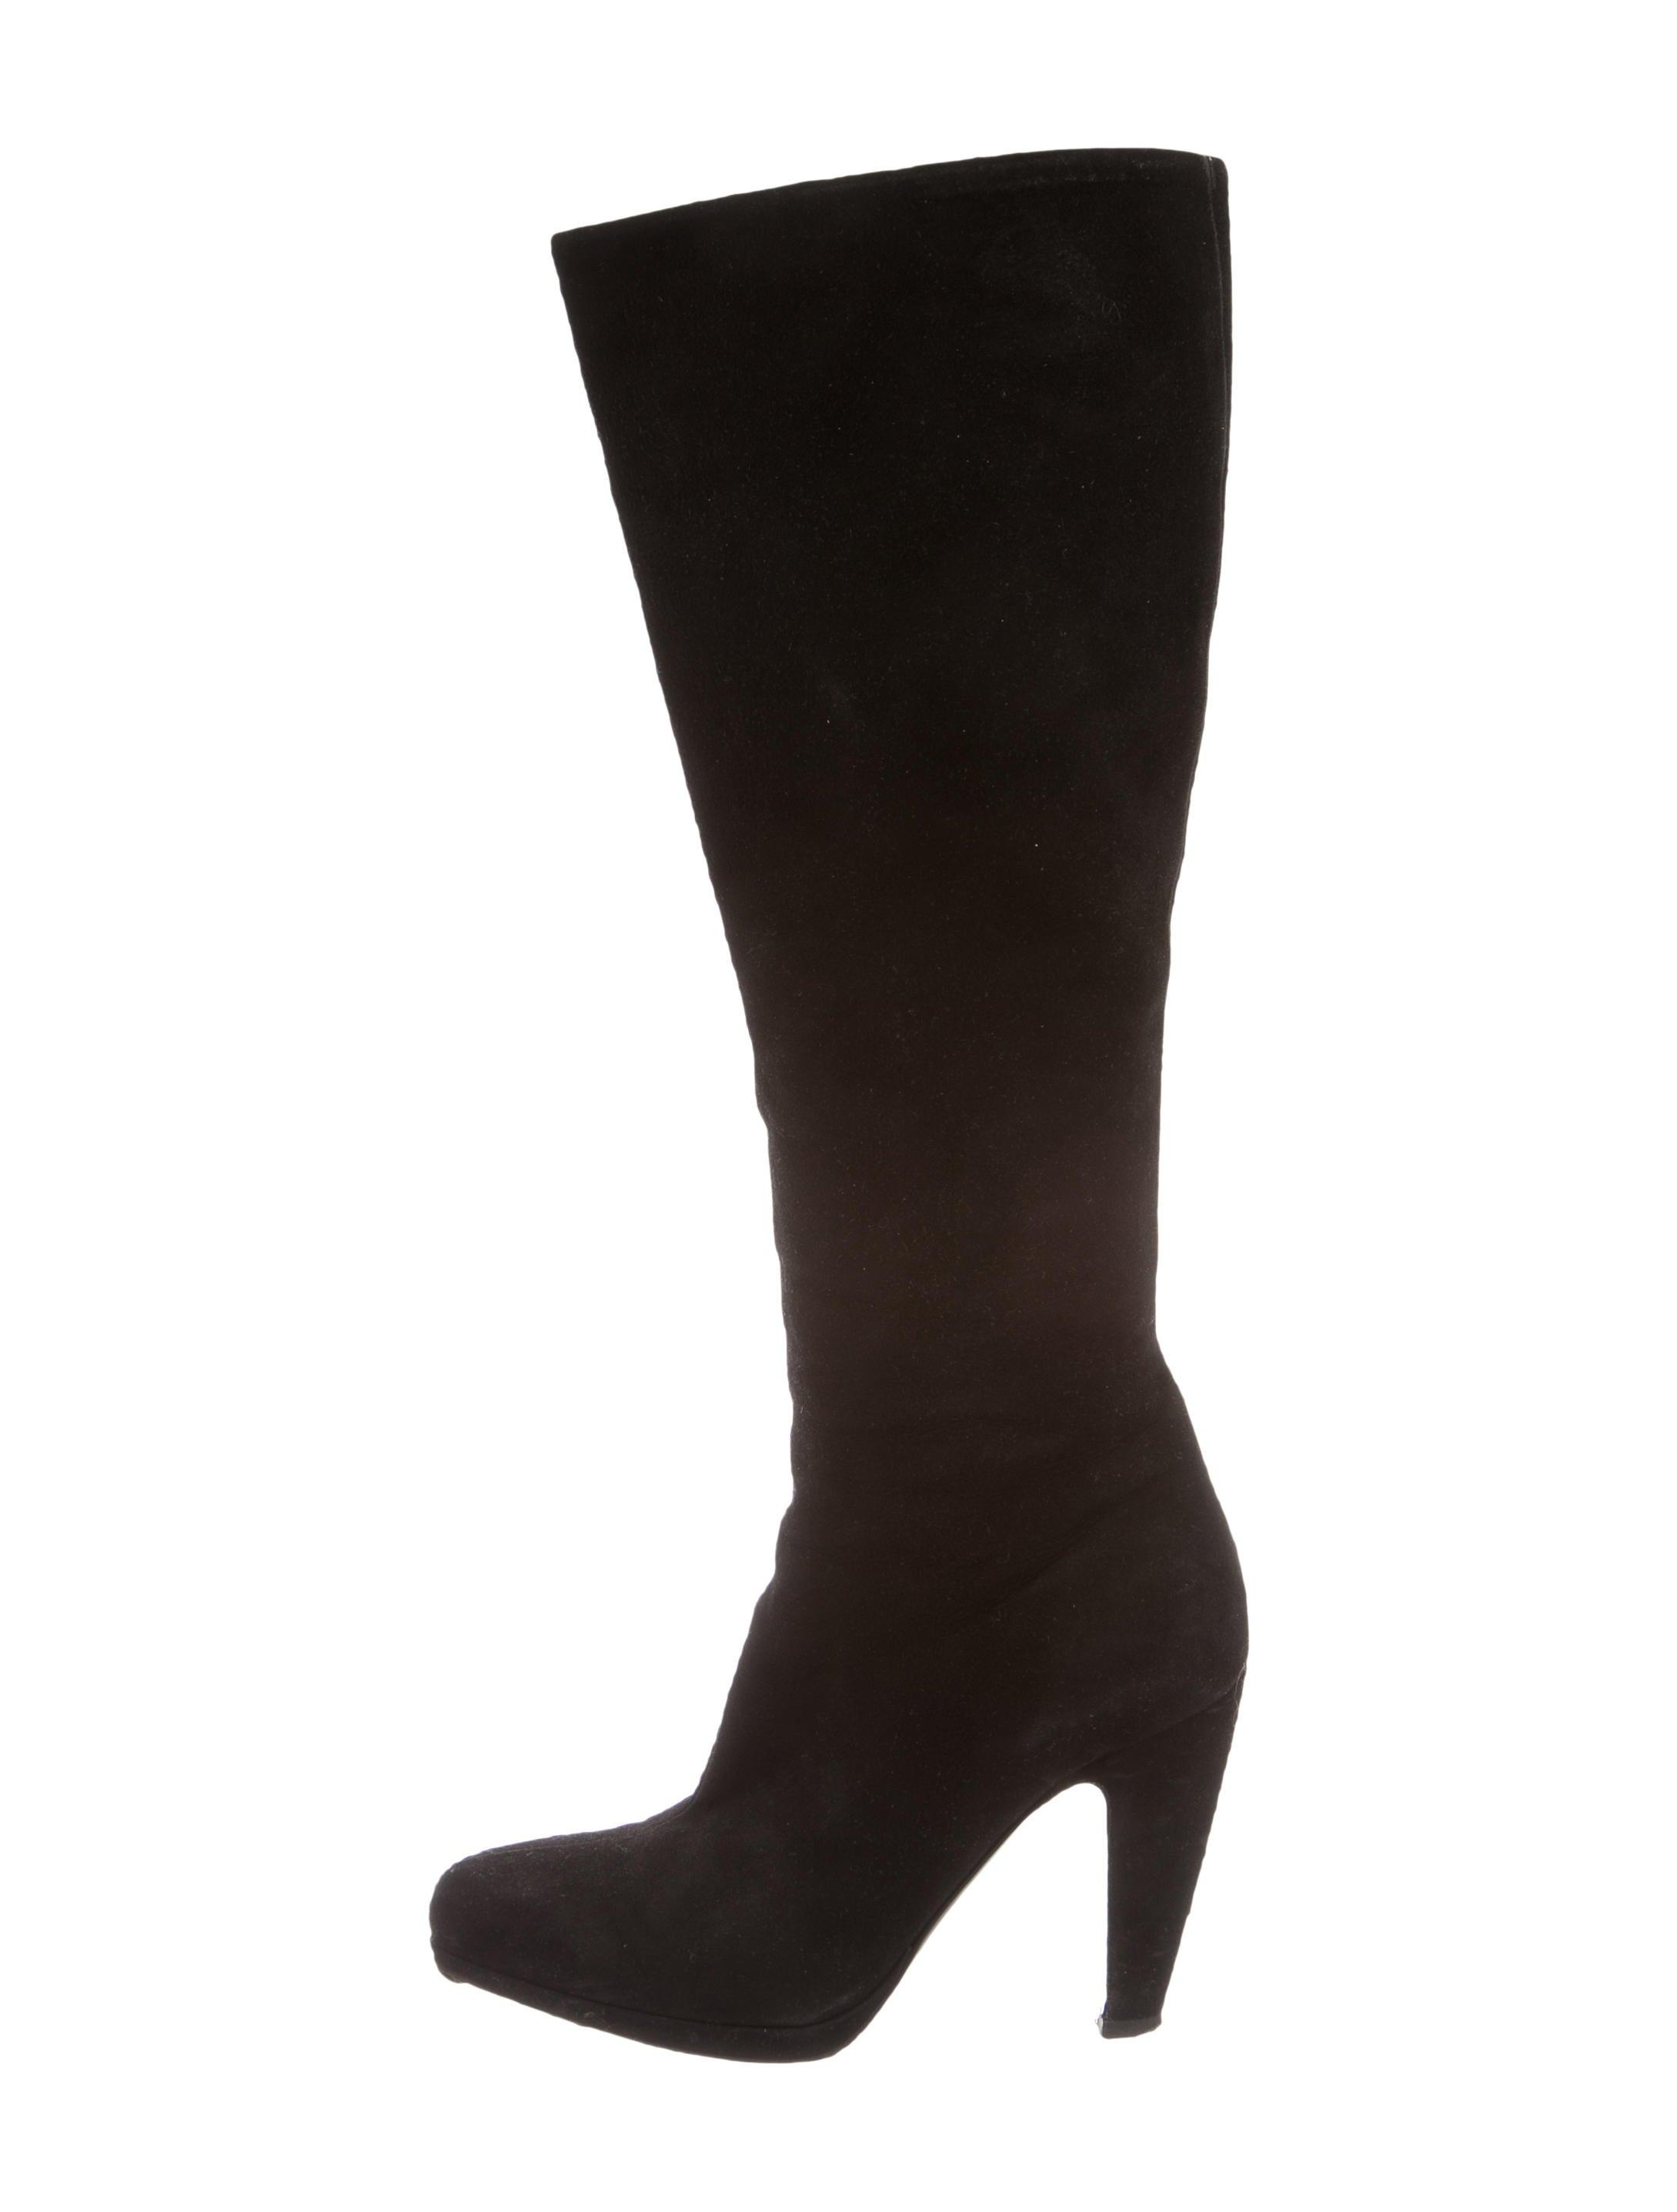 prada knee high suede boots shoes pra113697 the realreal